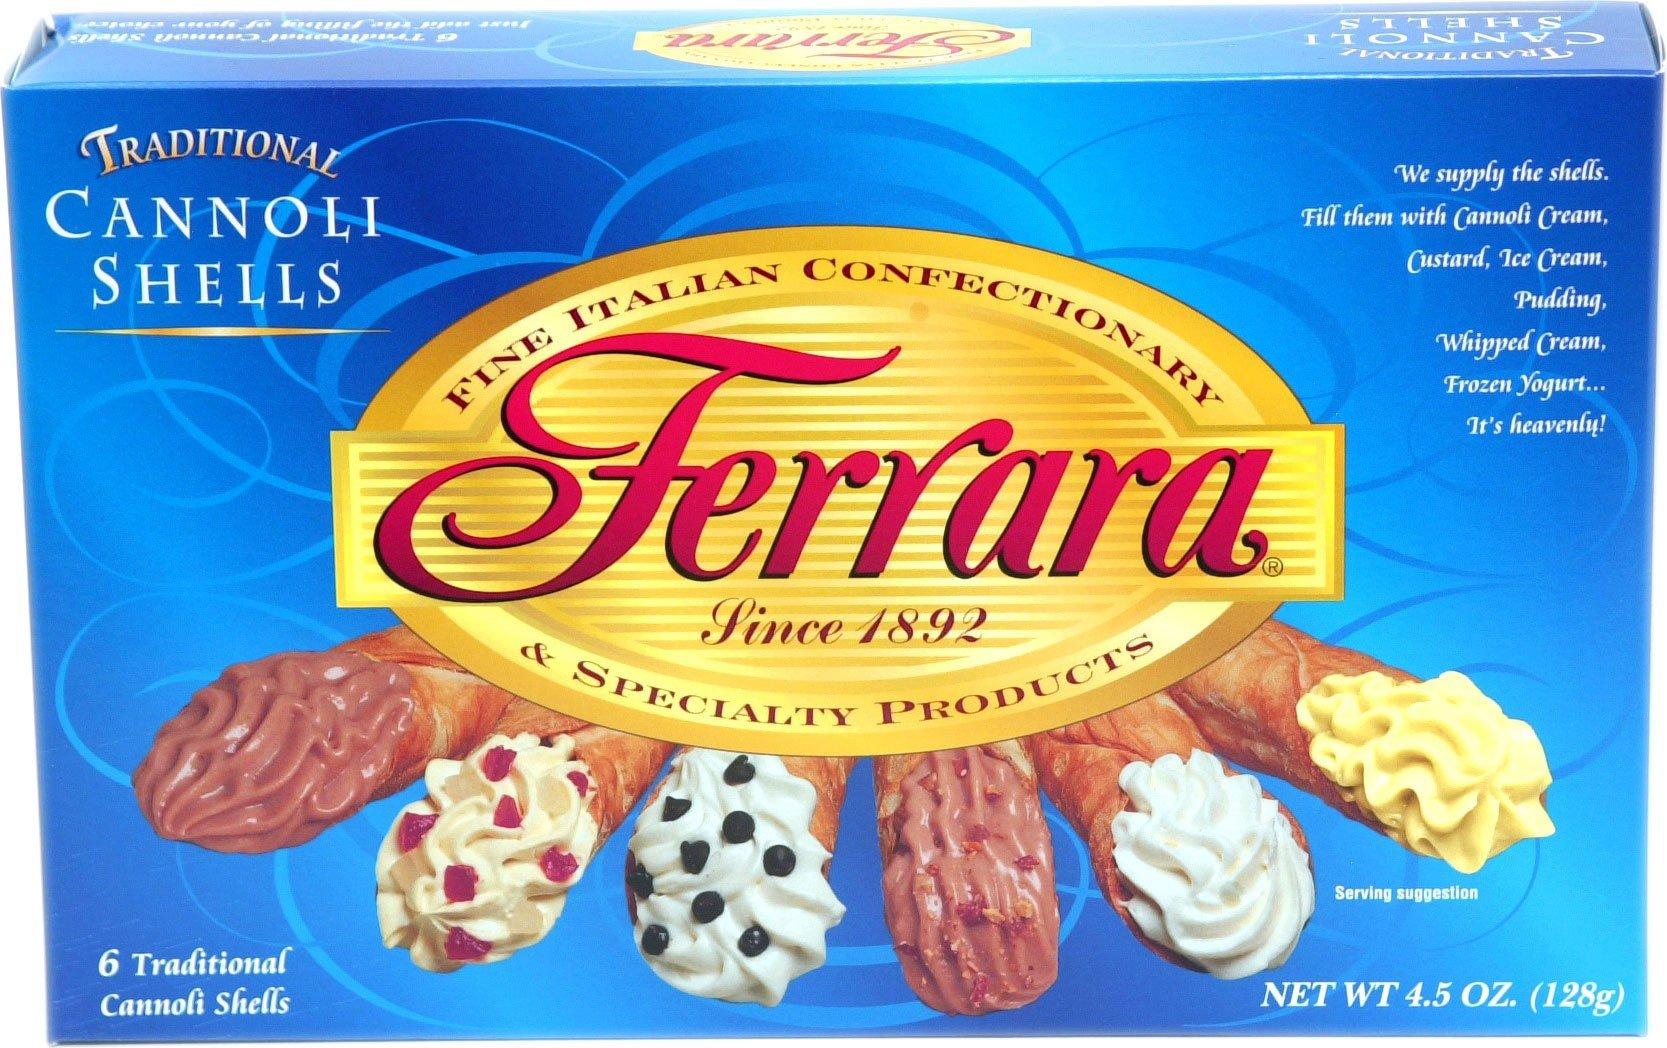 Ferrara Cannoli Shells - 2 boxes of 6 shells each